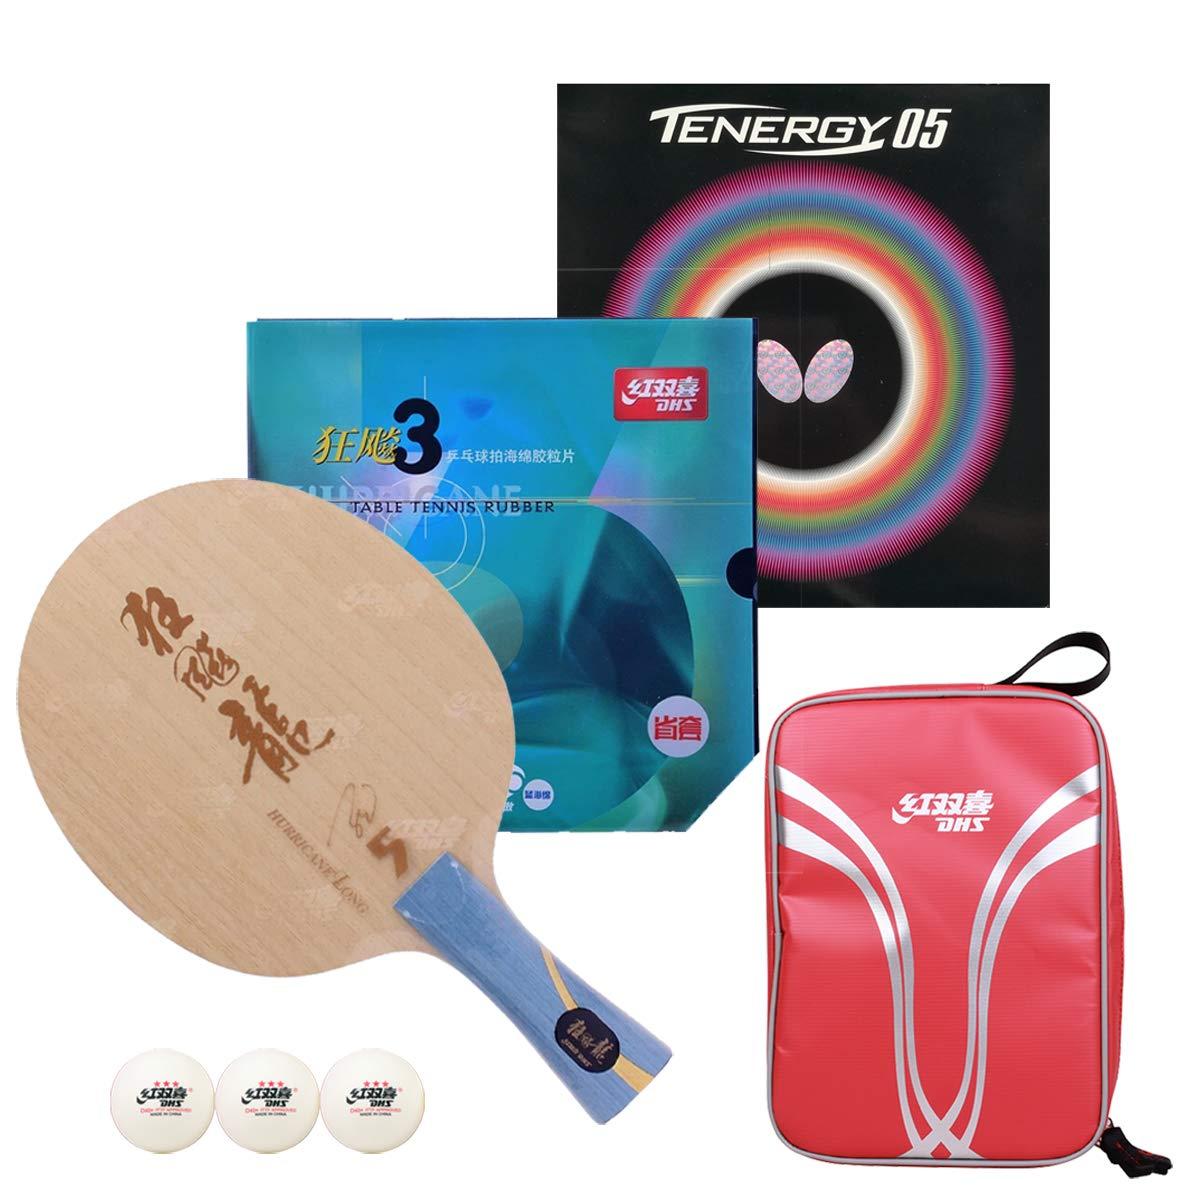 DHS Handwork プロフェッショナル 卓球ラケット - パドルテーブルテニスラケット + バタフライピンゴム 卓球用バッグ   B07H1D8TJV